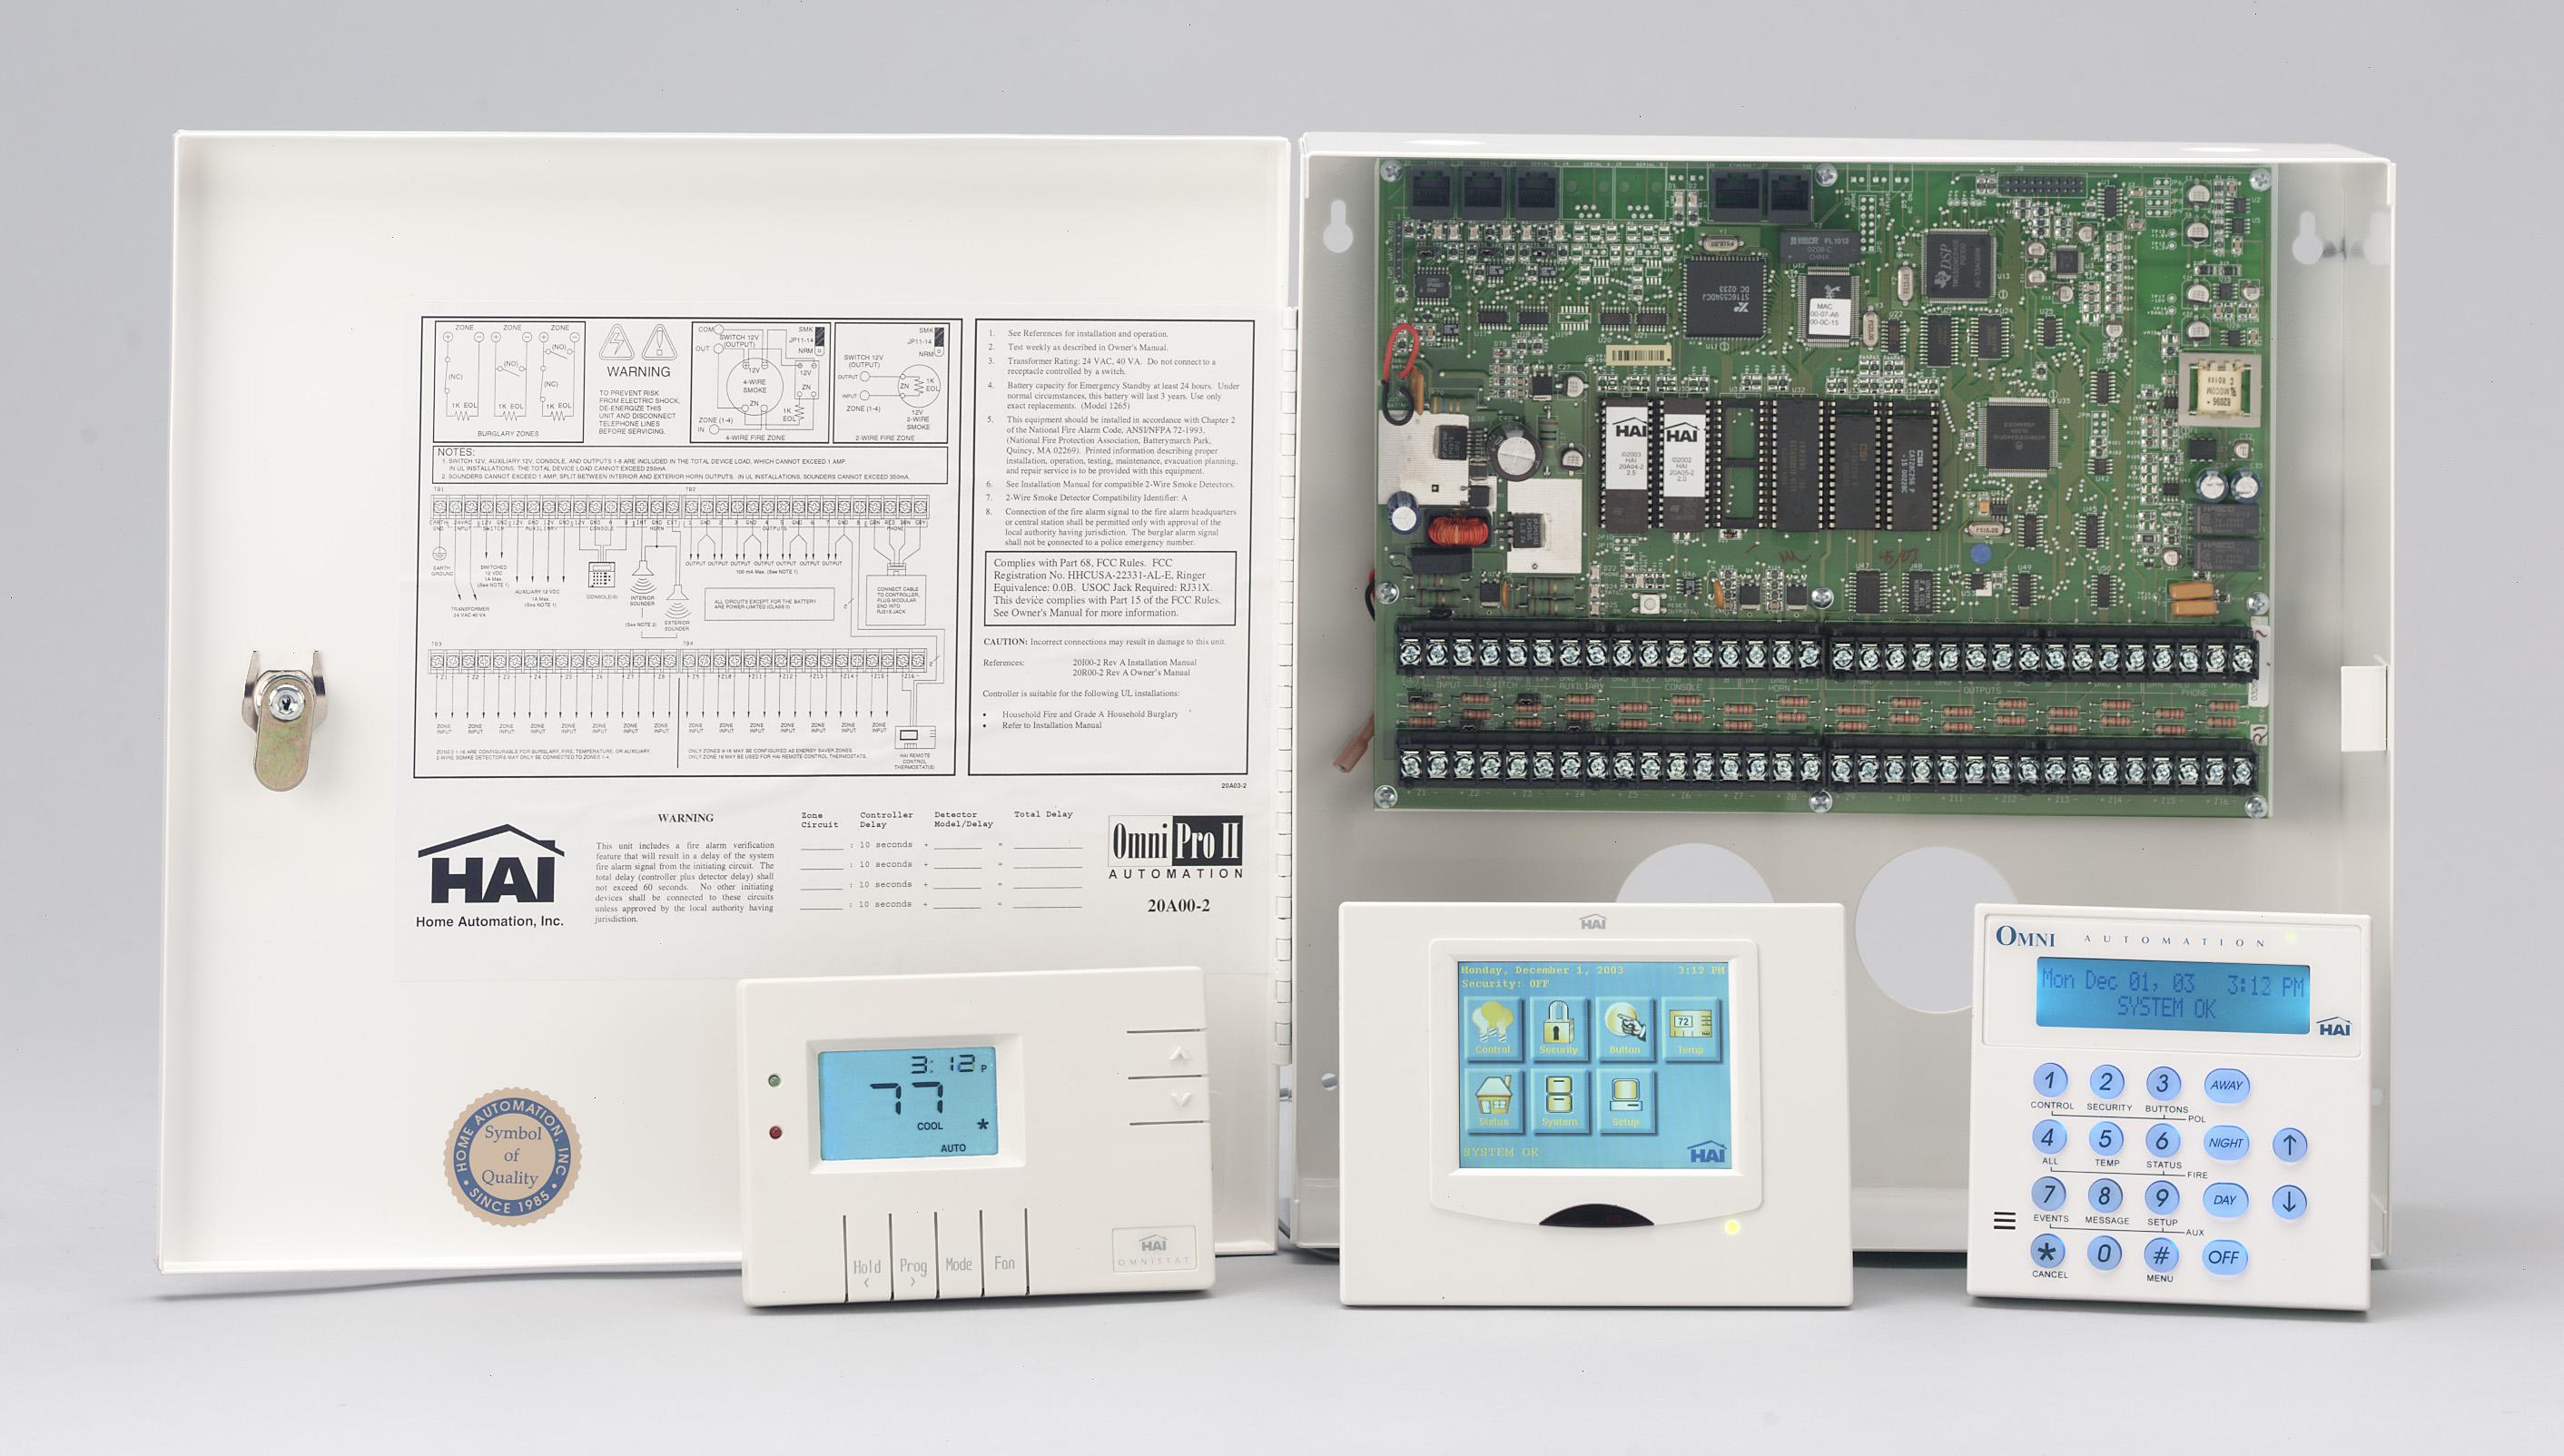 Quadomated » Home Automation Controller – HAI OmniPro II | Basic Wiring Home Automation Hai |  | Quadomated